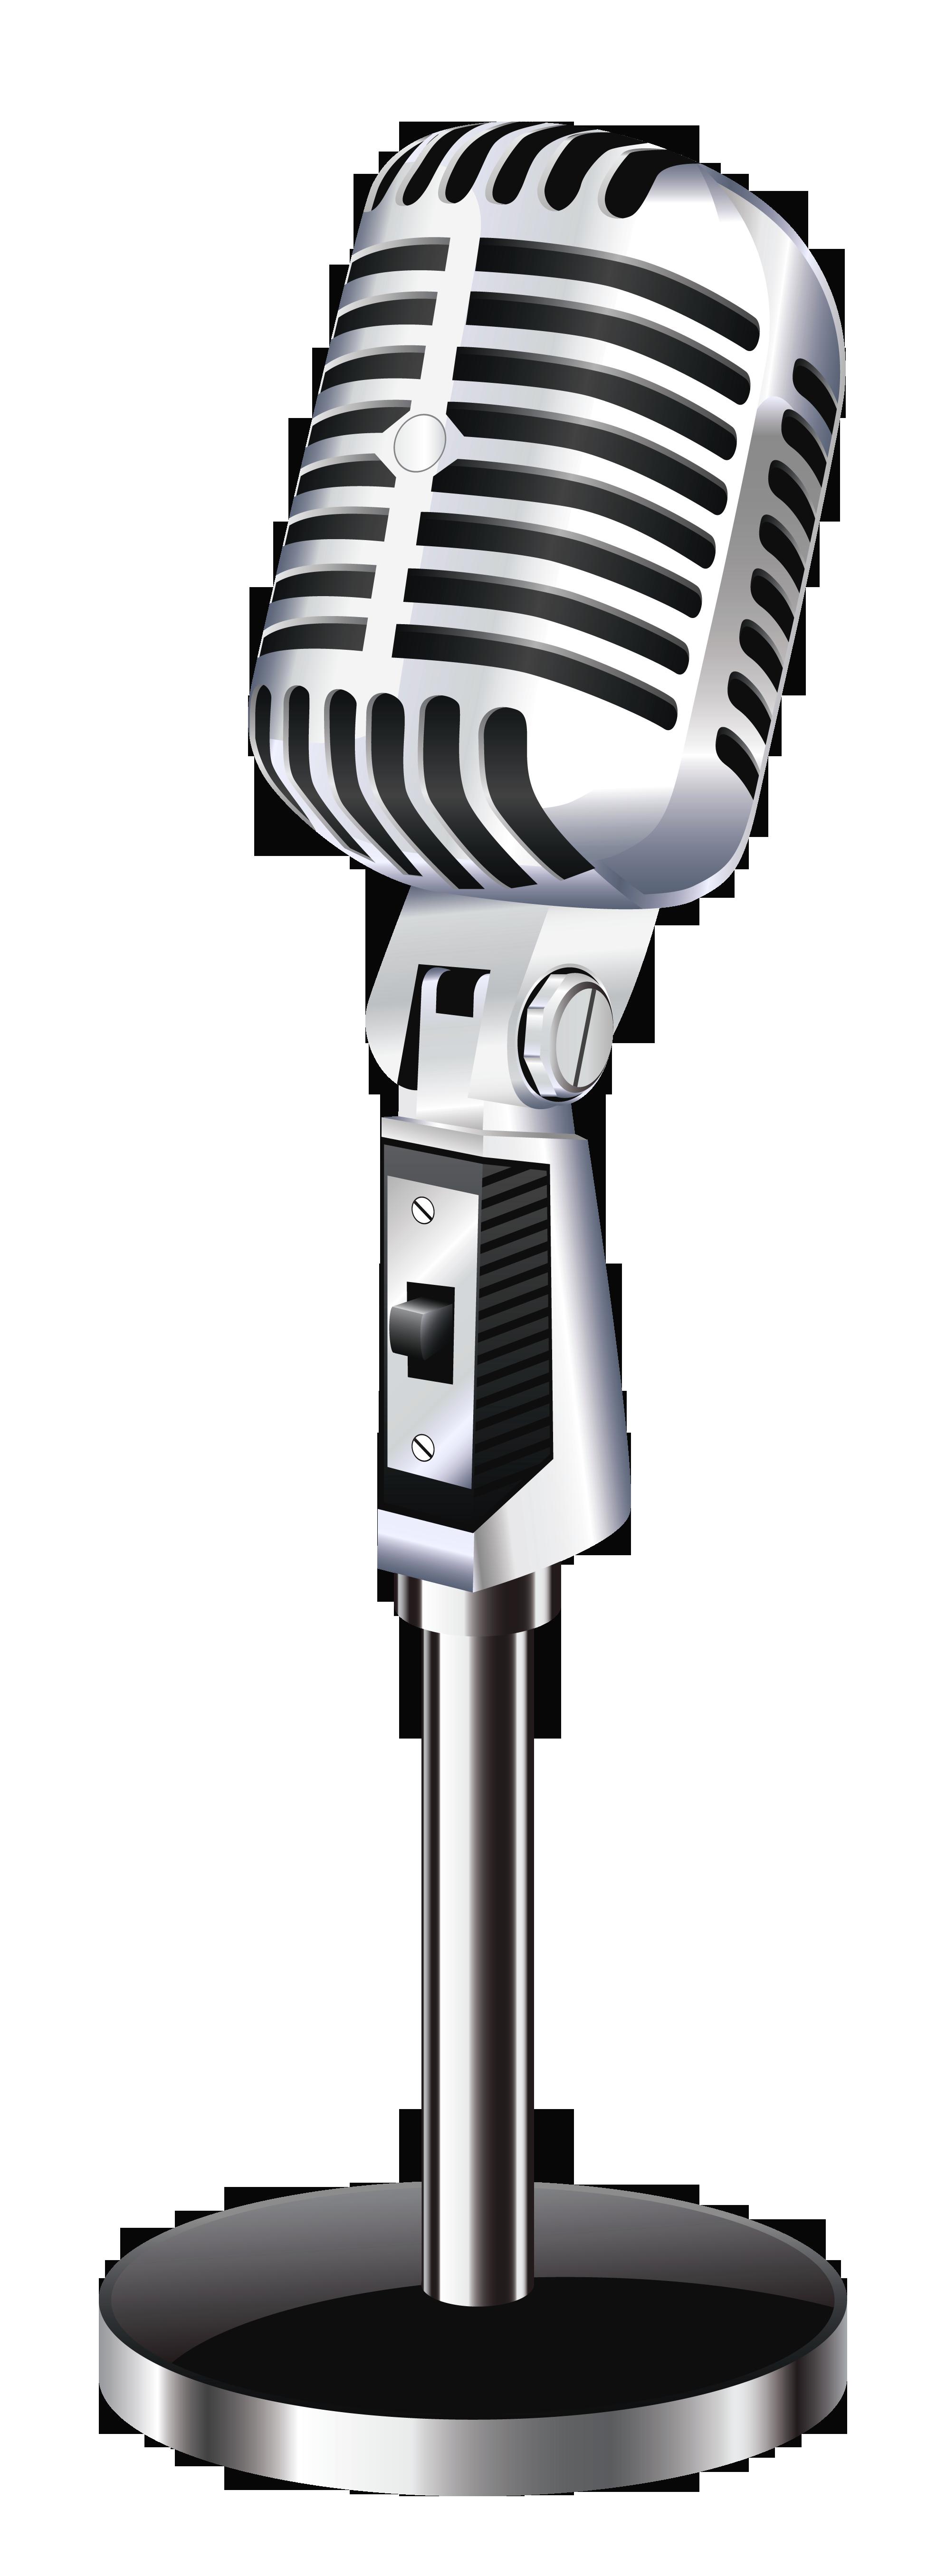 Microphone HD PNG - 92639